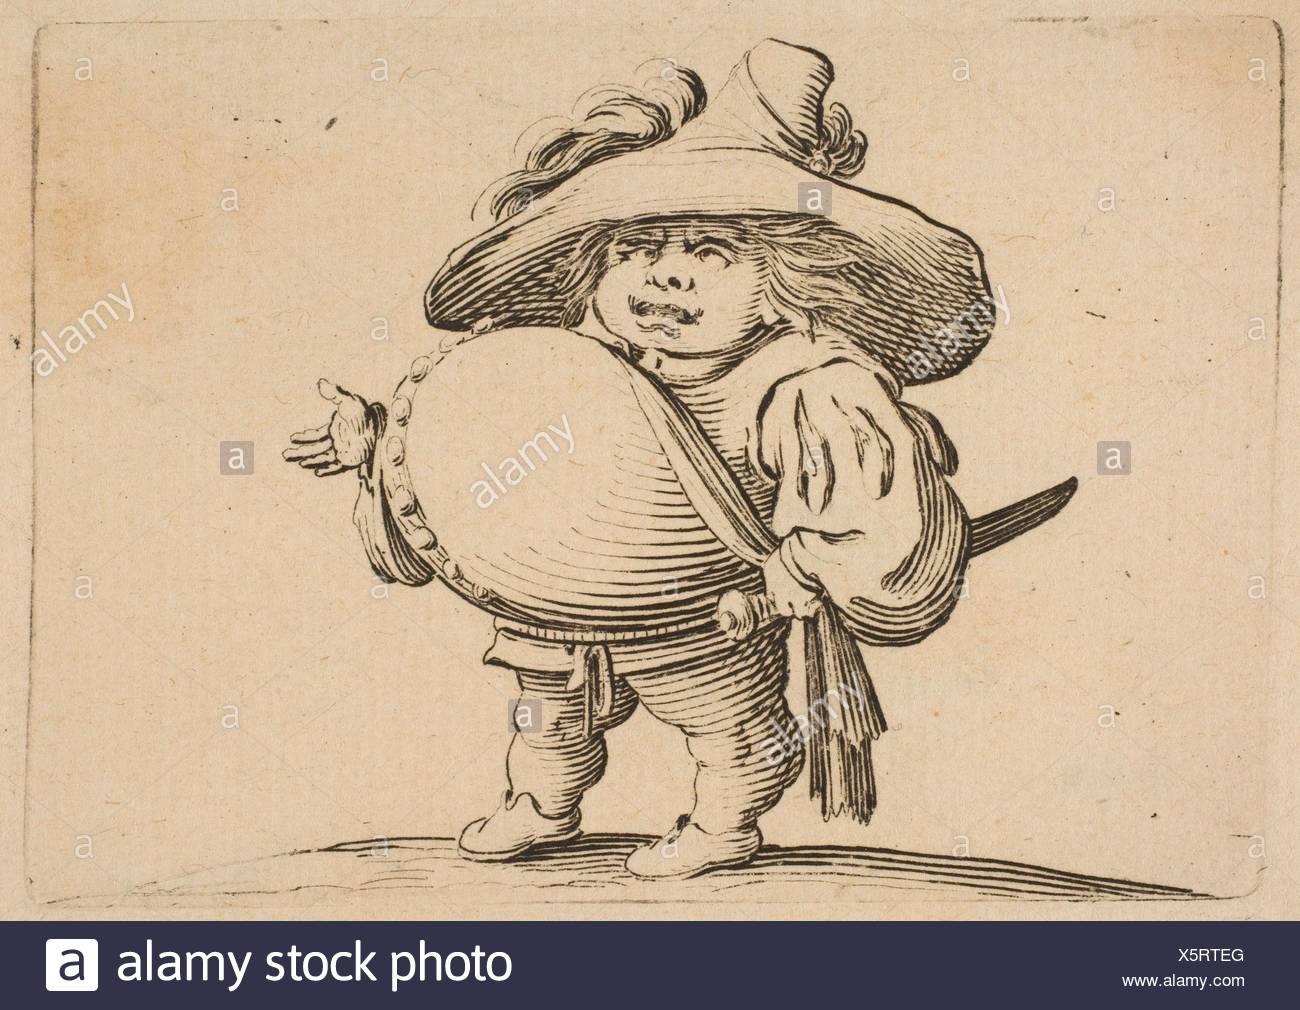 L'Homme au Gros Ventre Orné d'une Rangée de Boutons (Man with a Large Belly Decorated with a Row of Buttons), from Varie Figure Gobbi, suite appelée - Stock Image